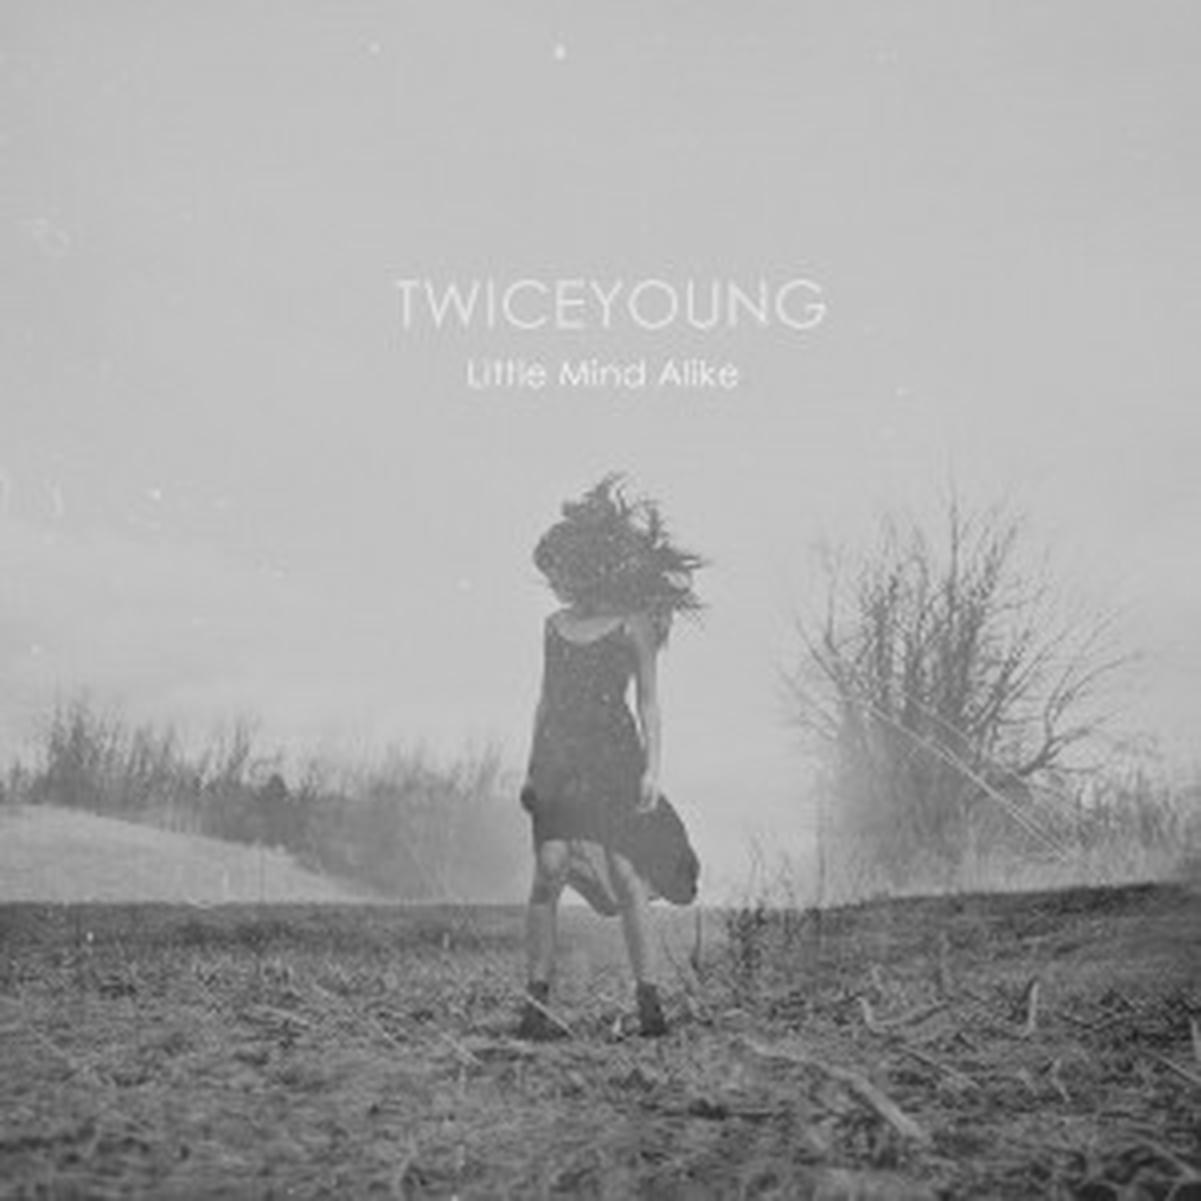 twiceyoung